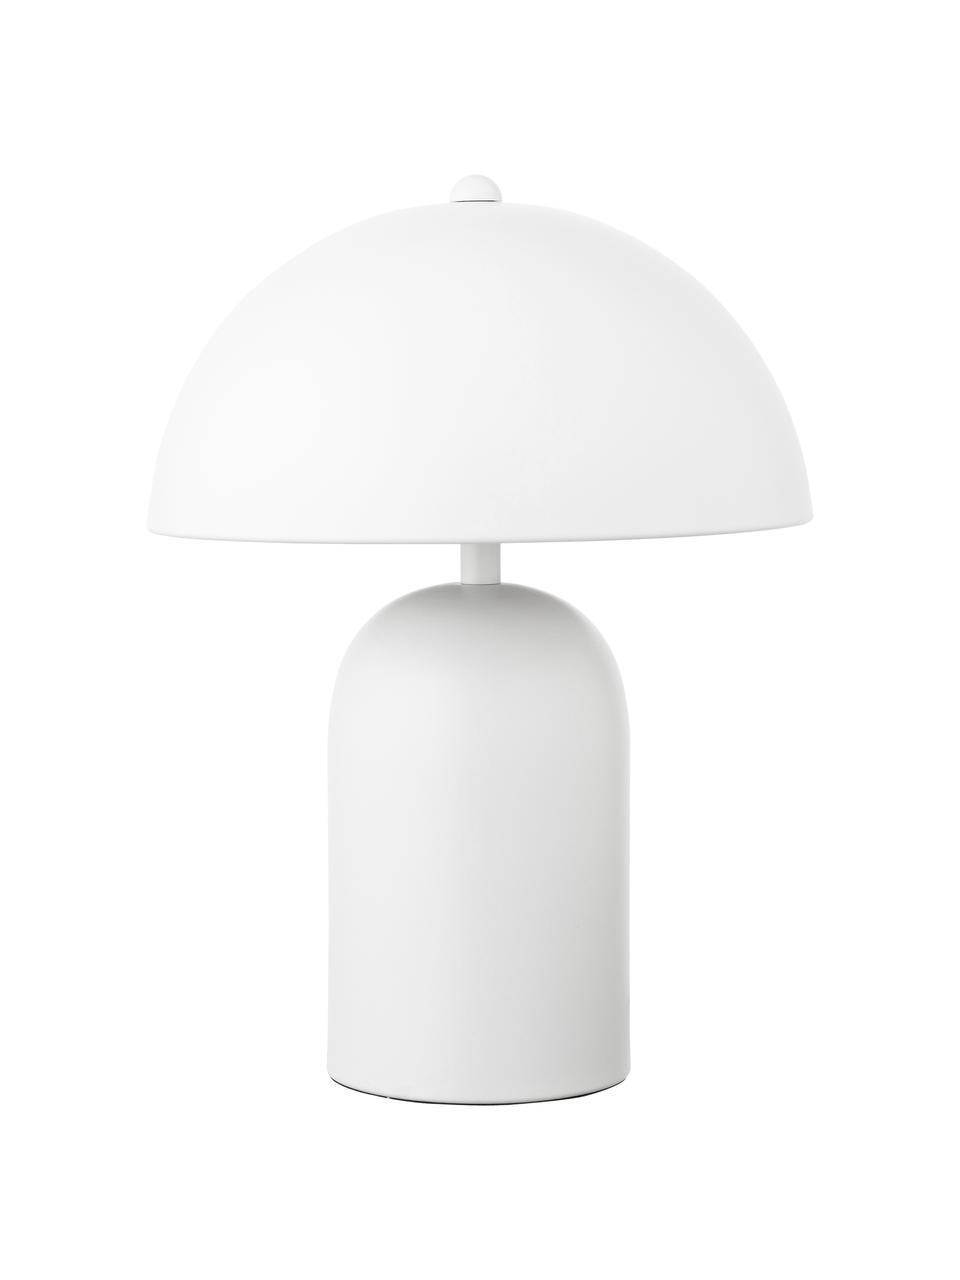 Petite lampe de nuit blancheWalter, Blanc mat